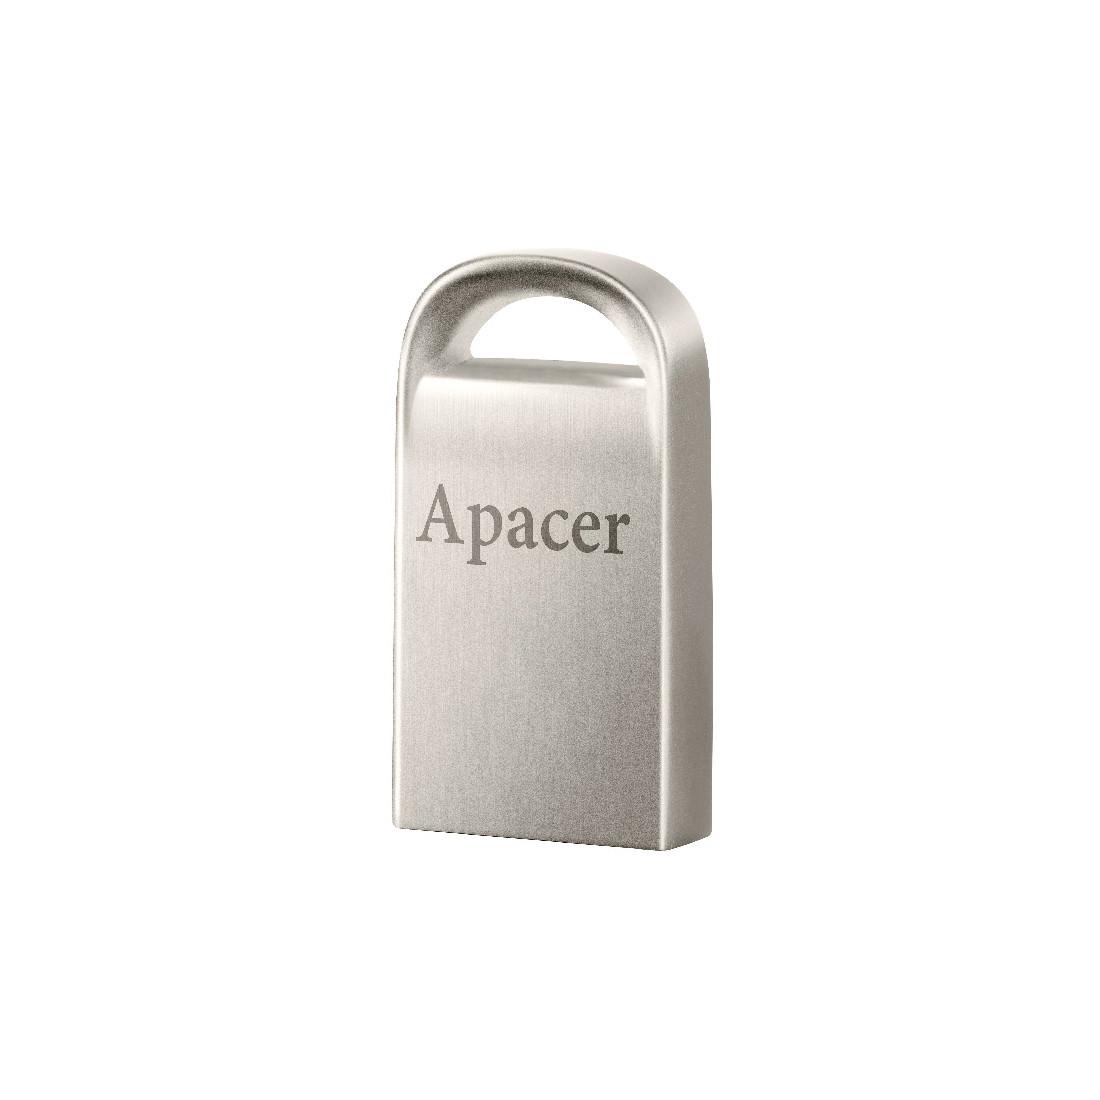 USB-накопитель, Apacer, AH115, AP64GAH115S-1, 64GB, USB 2.0, Серый